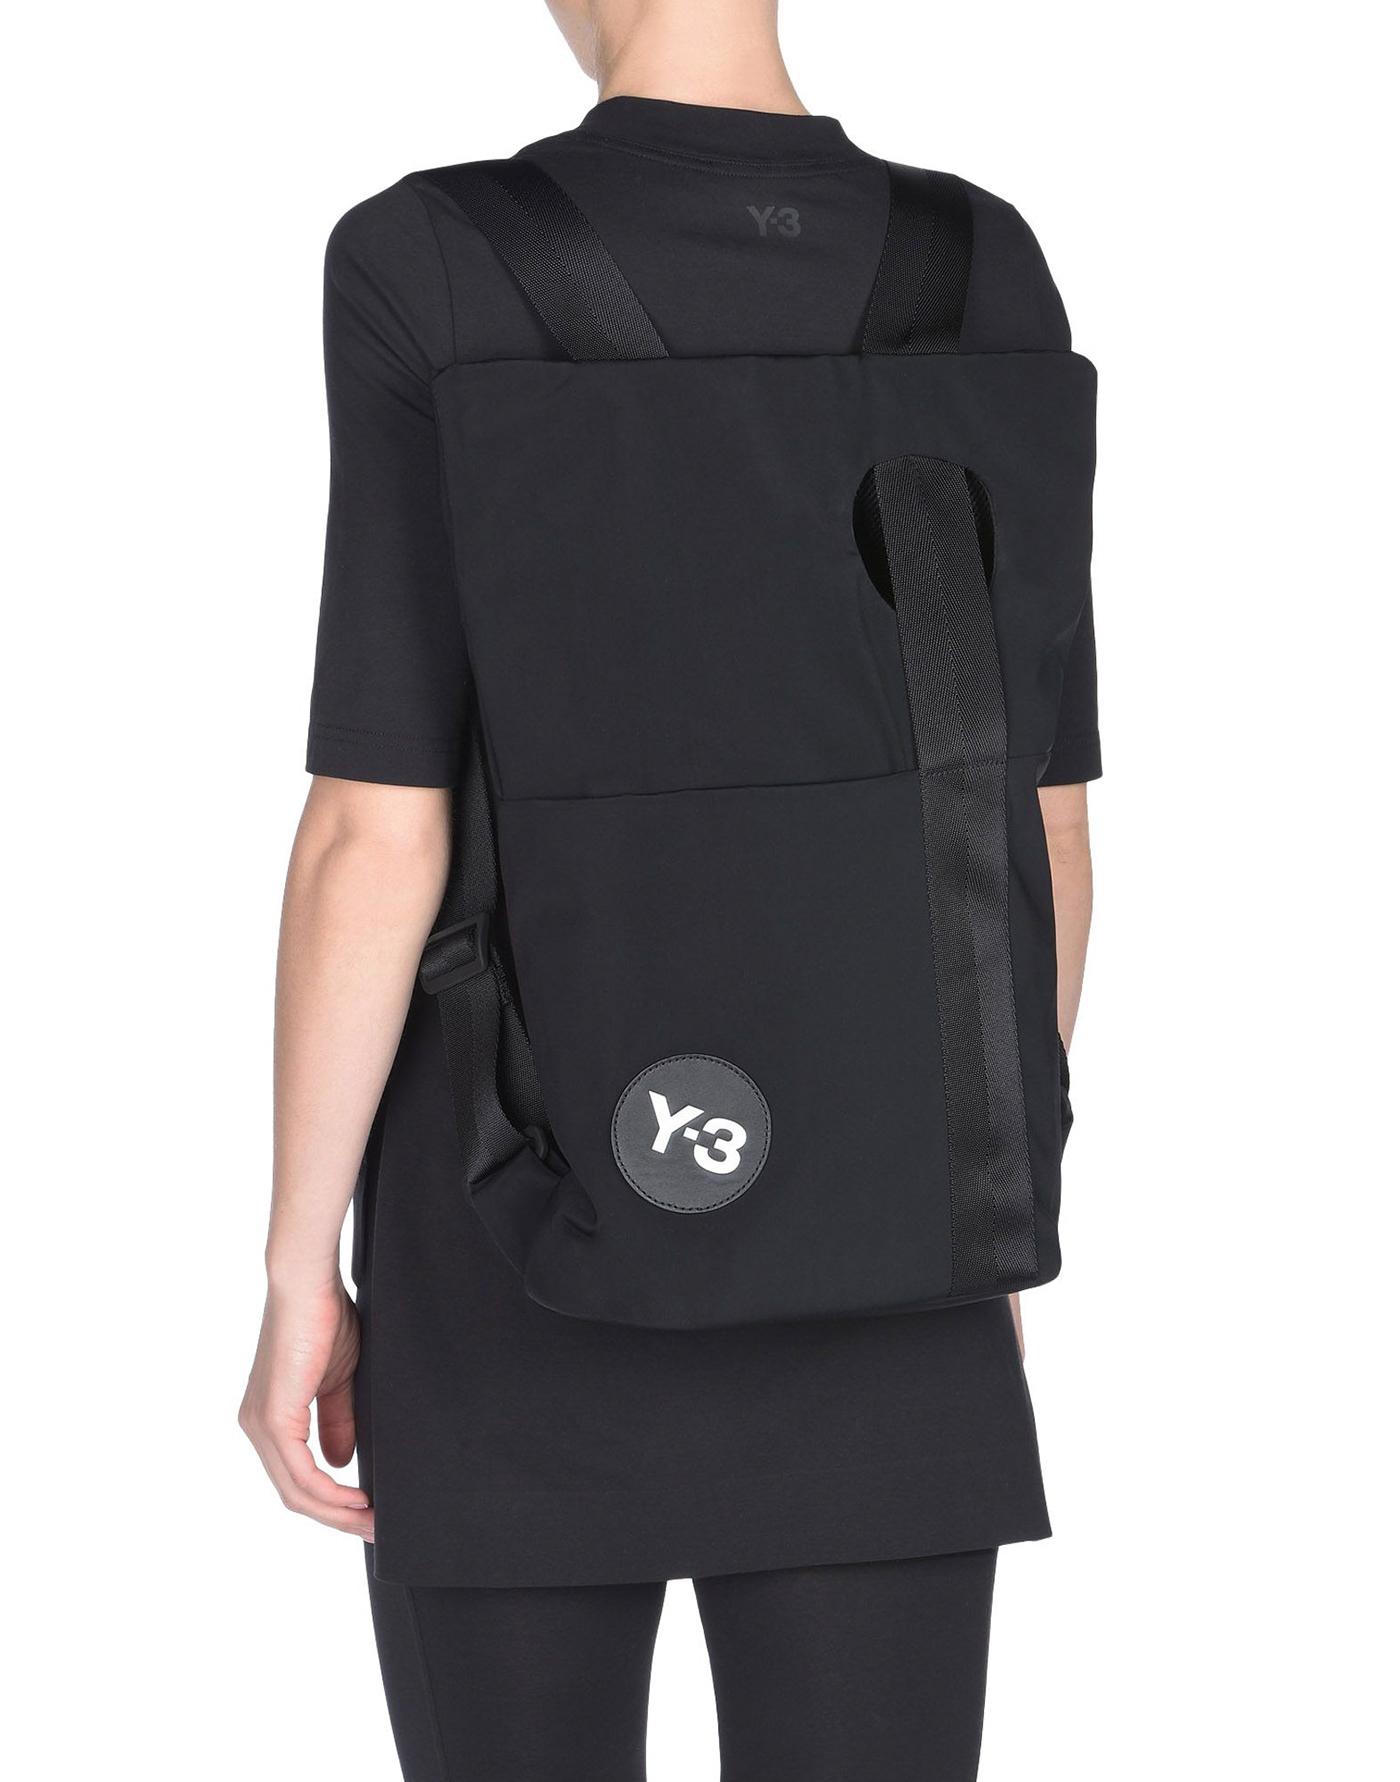 20441511e30a Y-3 YOHJI YAMAMOTO WMNs Bags on Behance